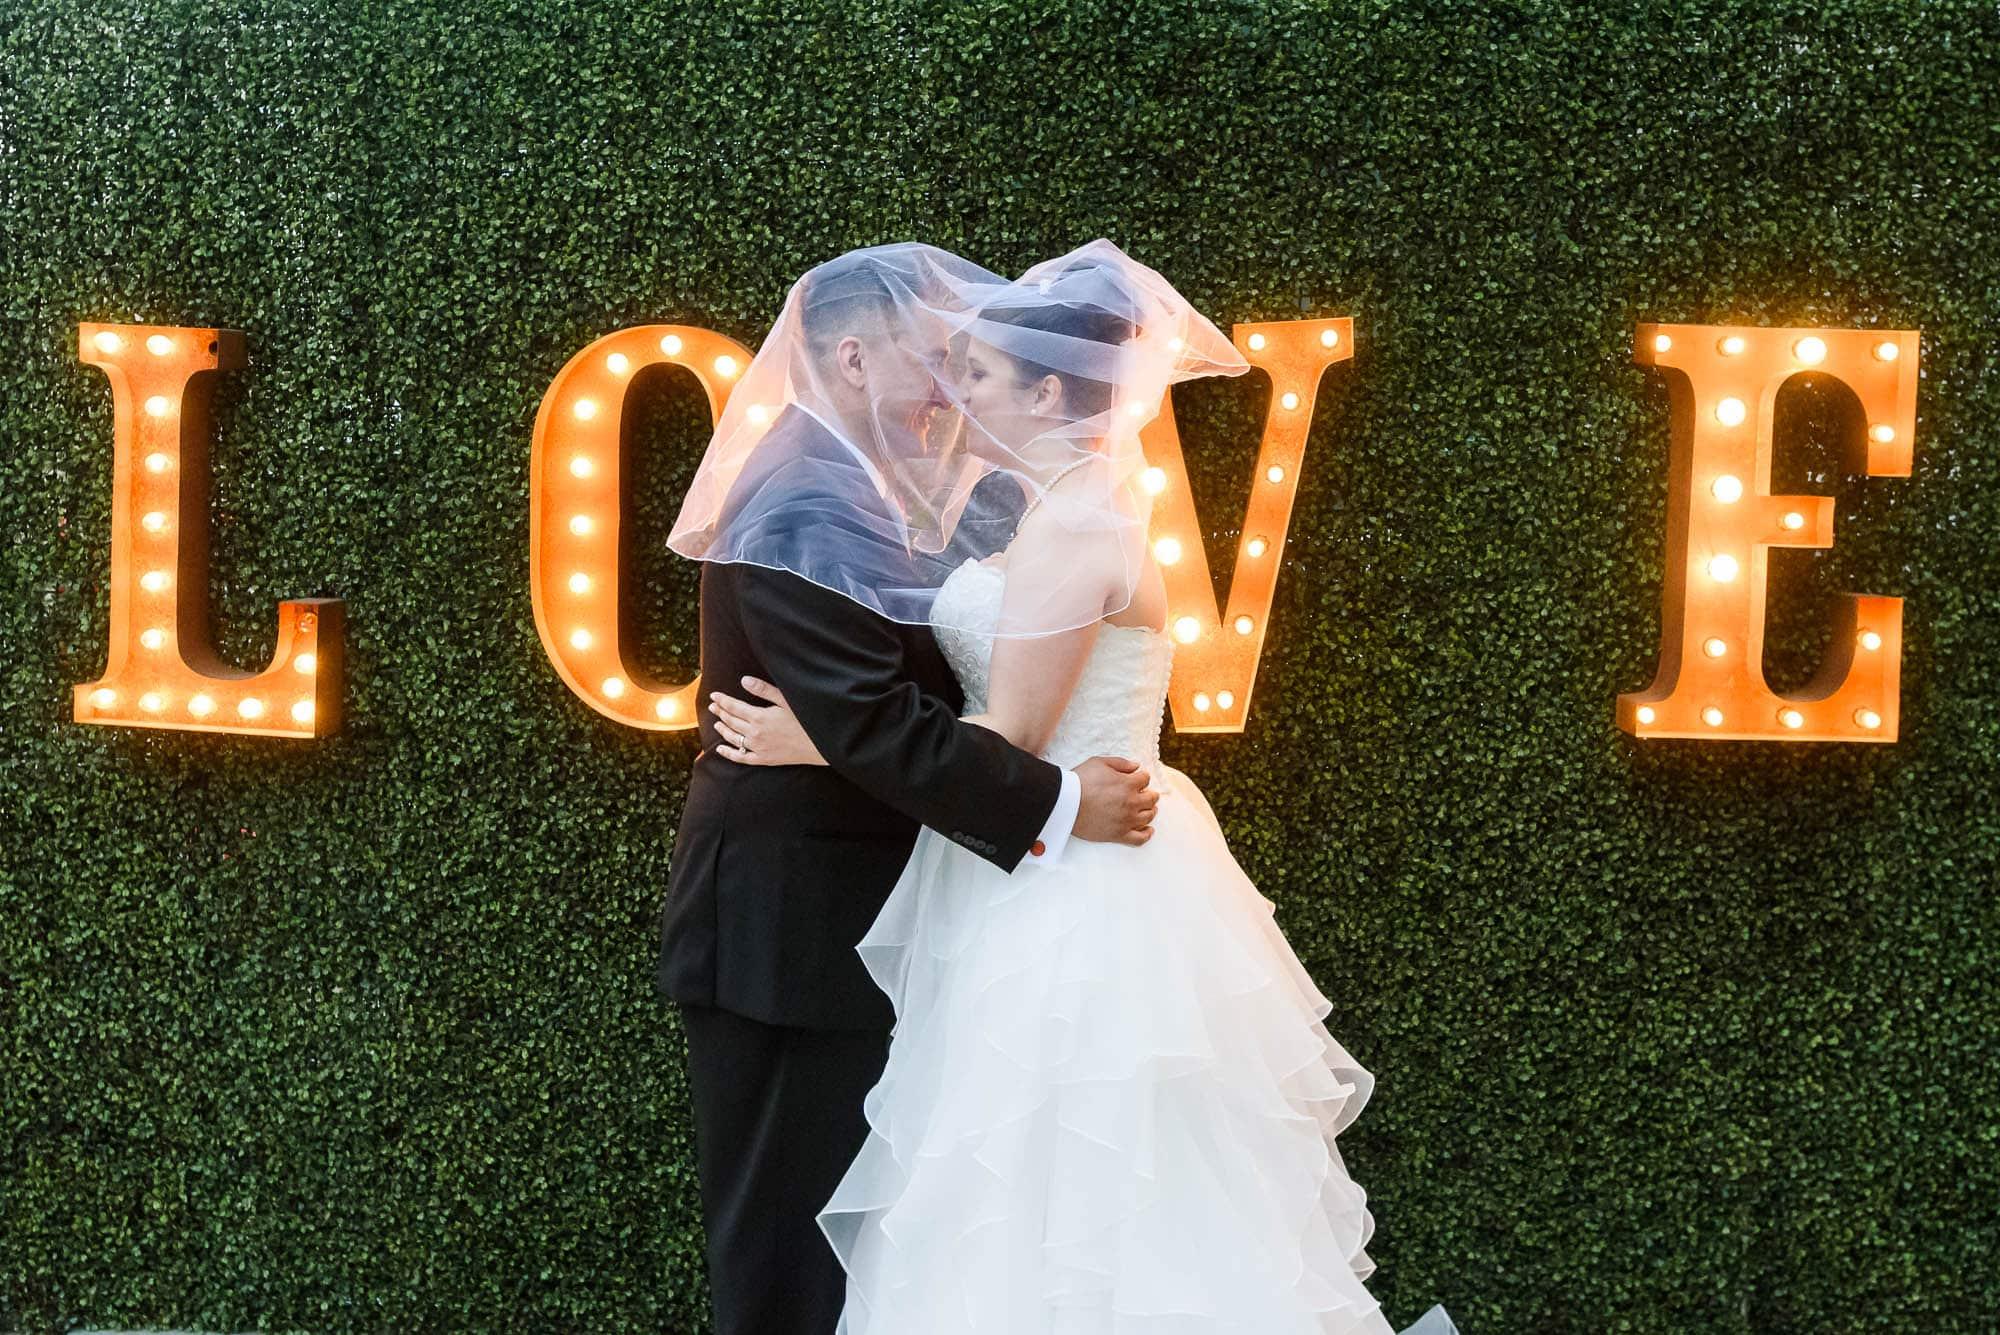 025_Alan_and_Heidi_Wedding_Nicole_Roman